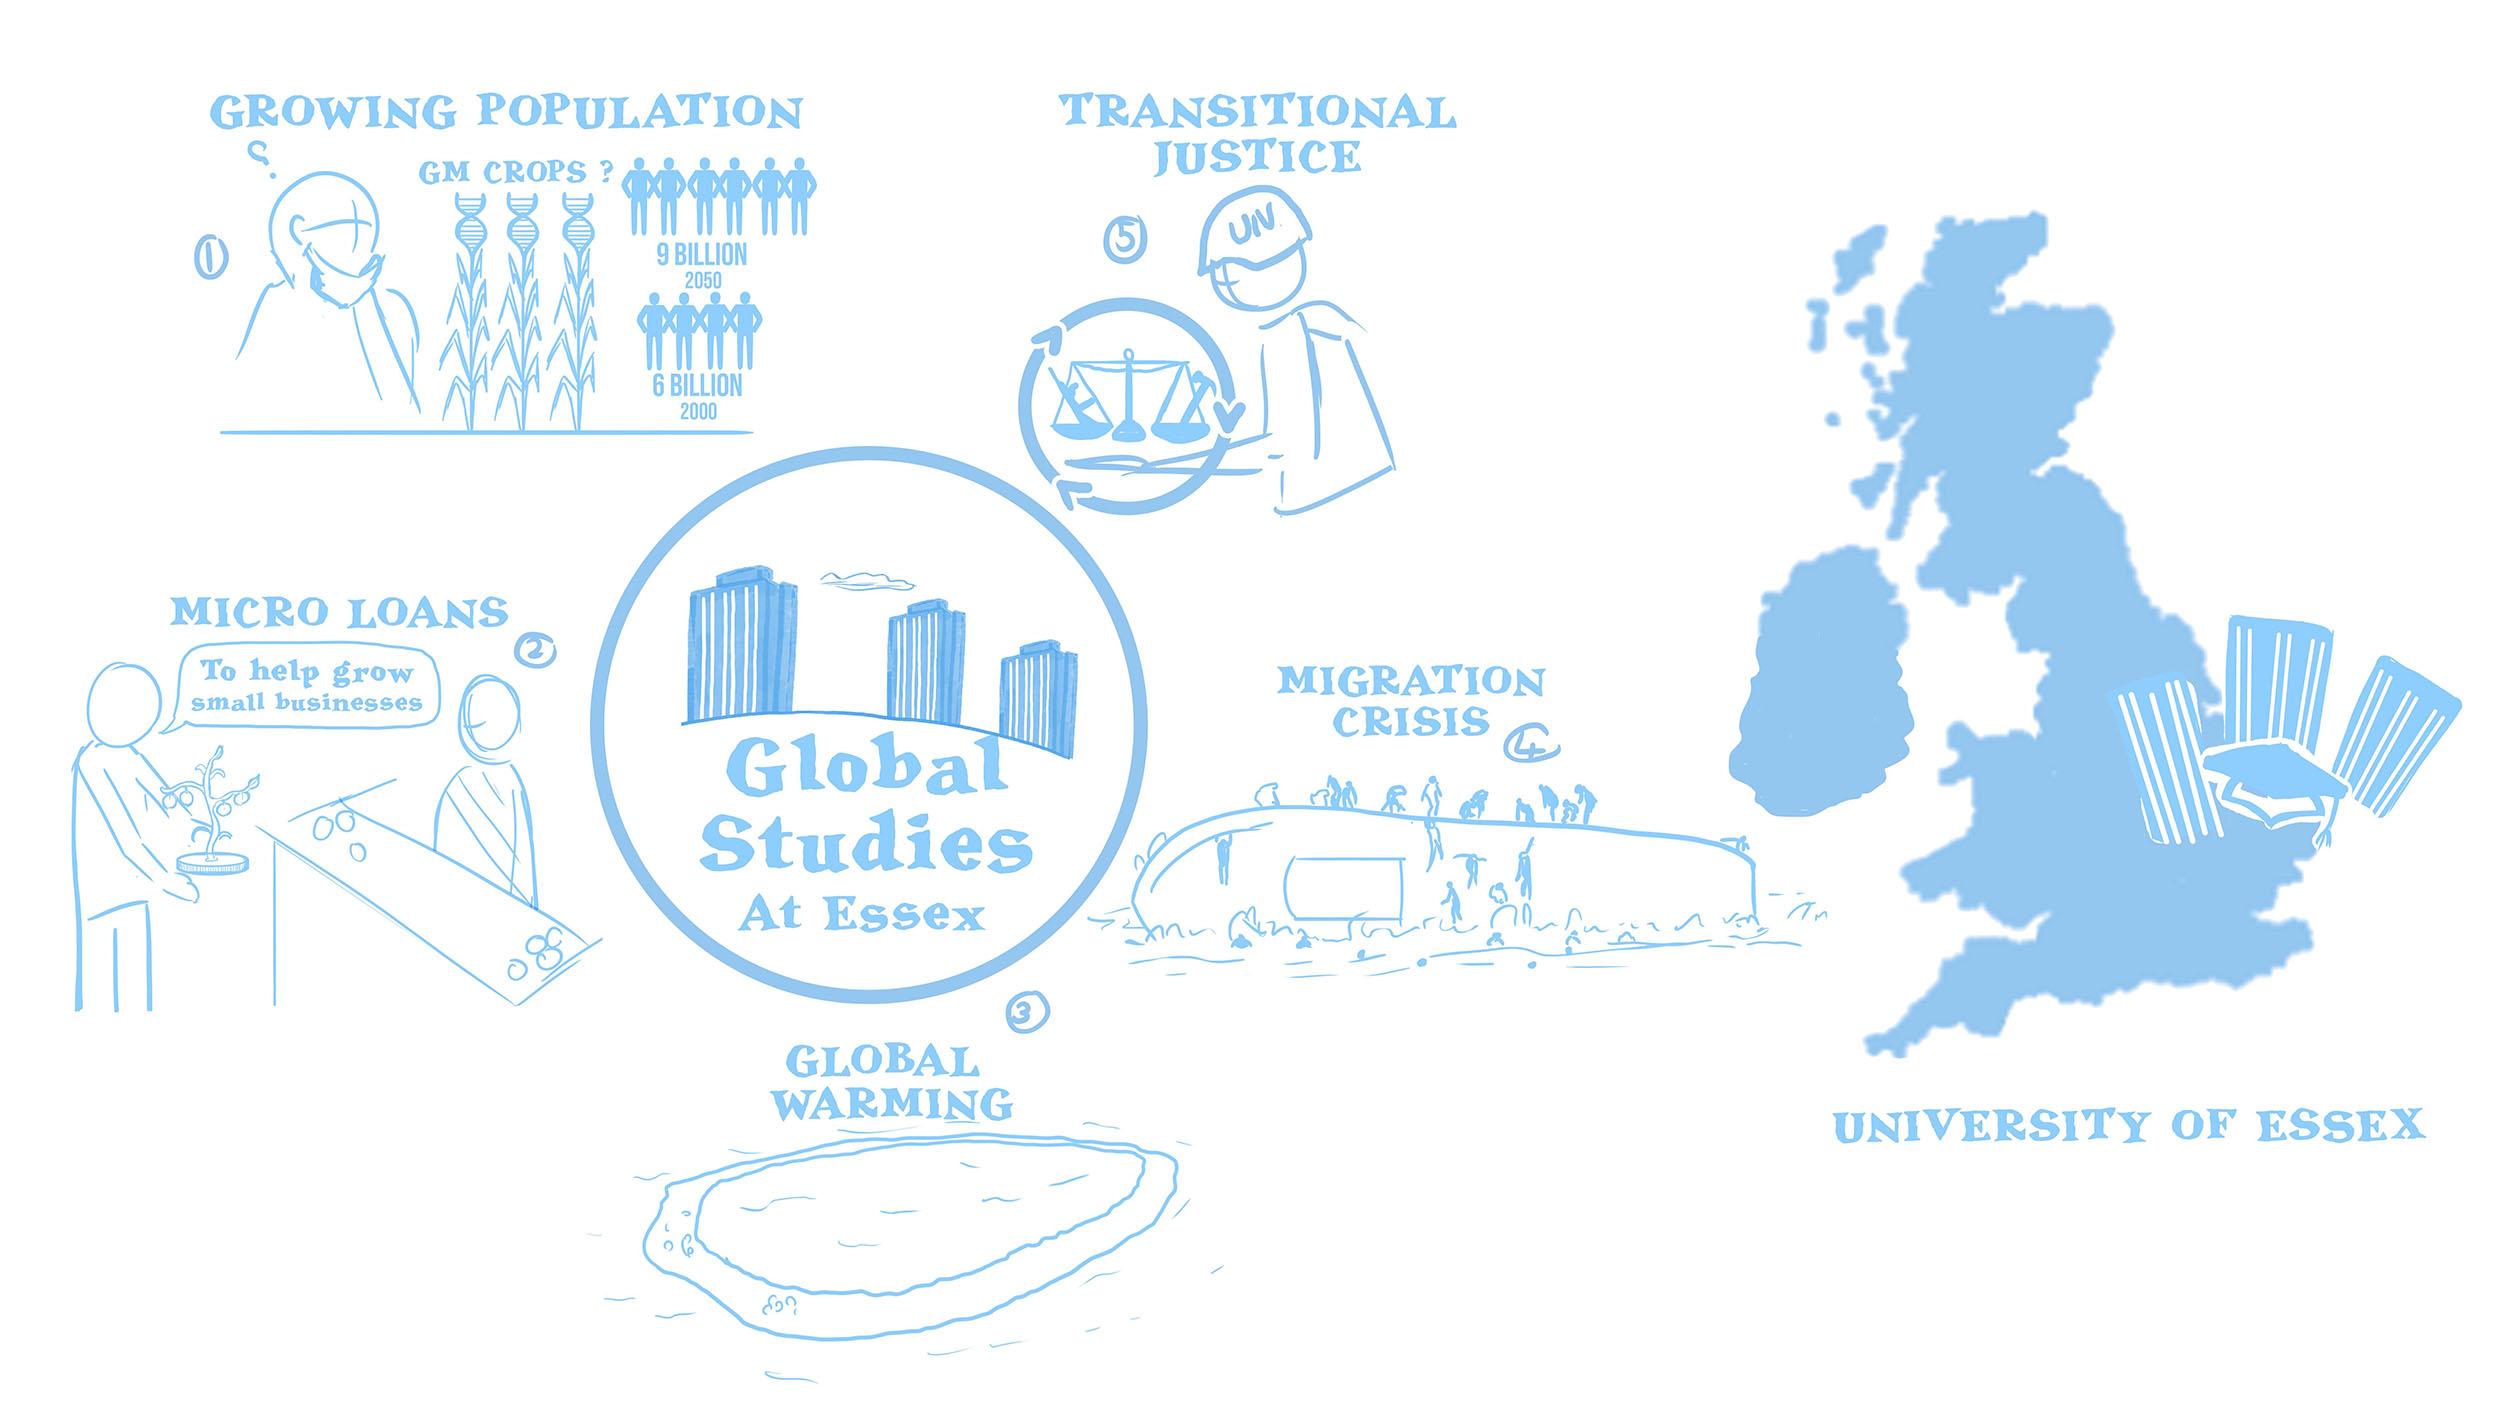 university-of-essex-global-studies-cognitive-02.jpg